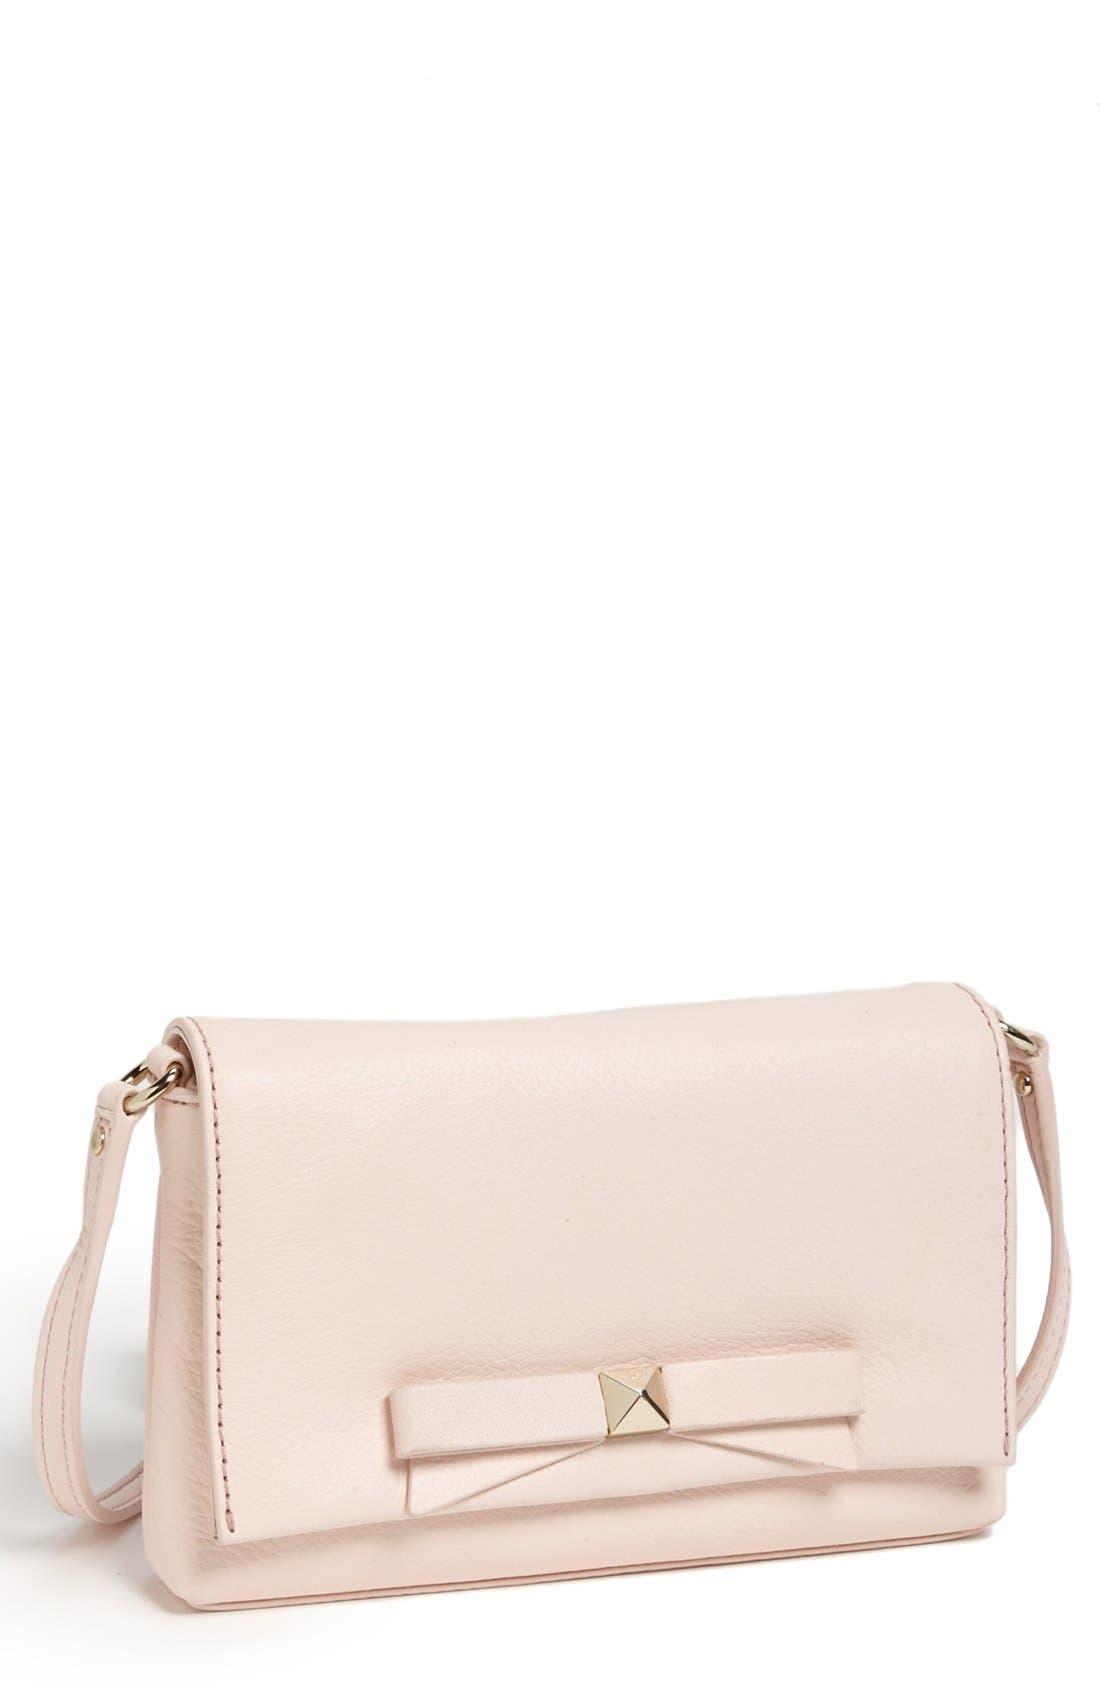 Main Image - kate spade new york 'bright light - carah' crossbody bag